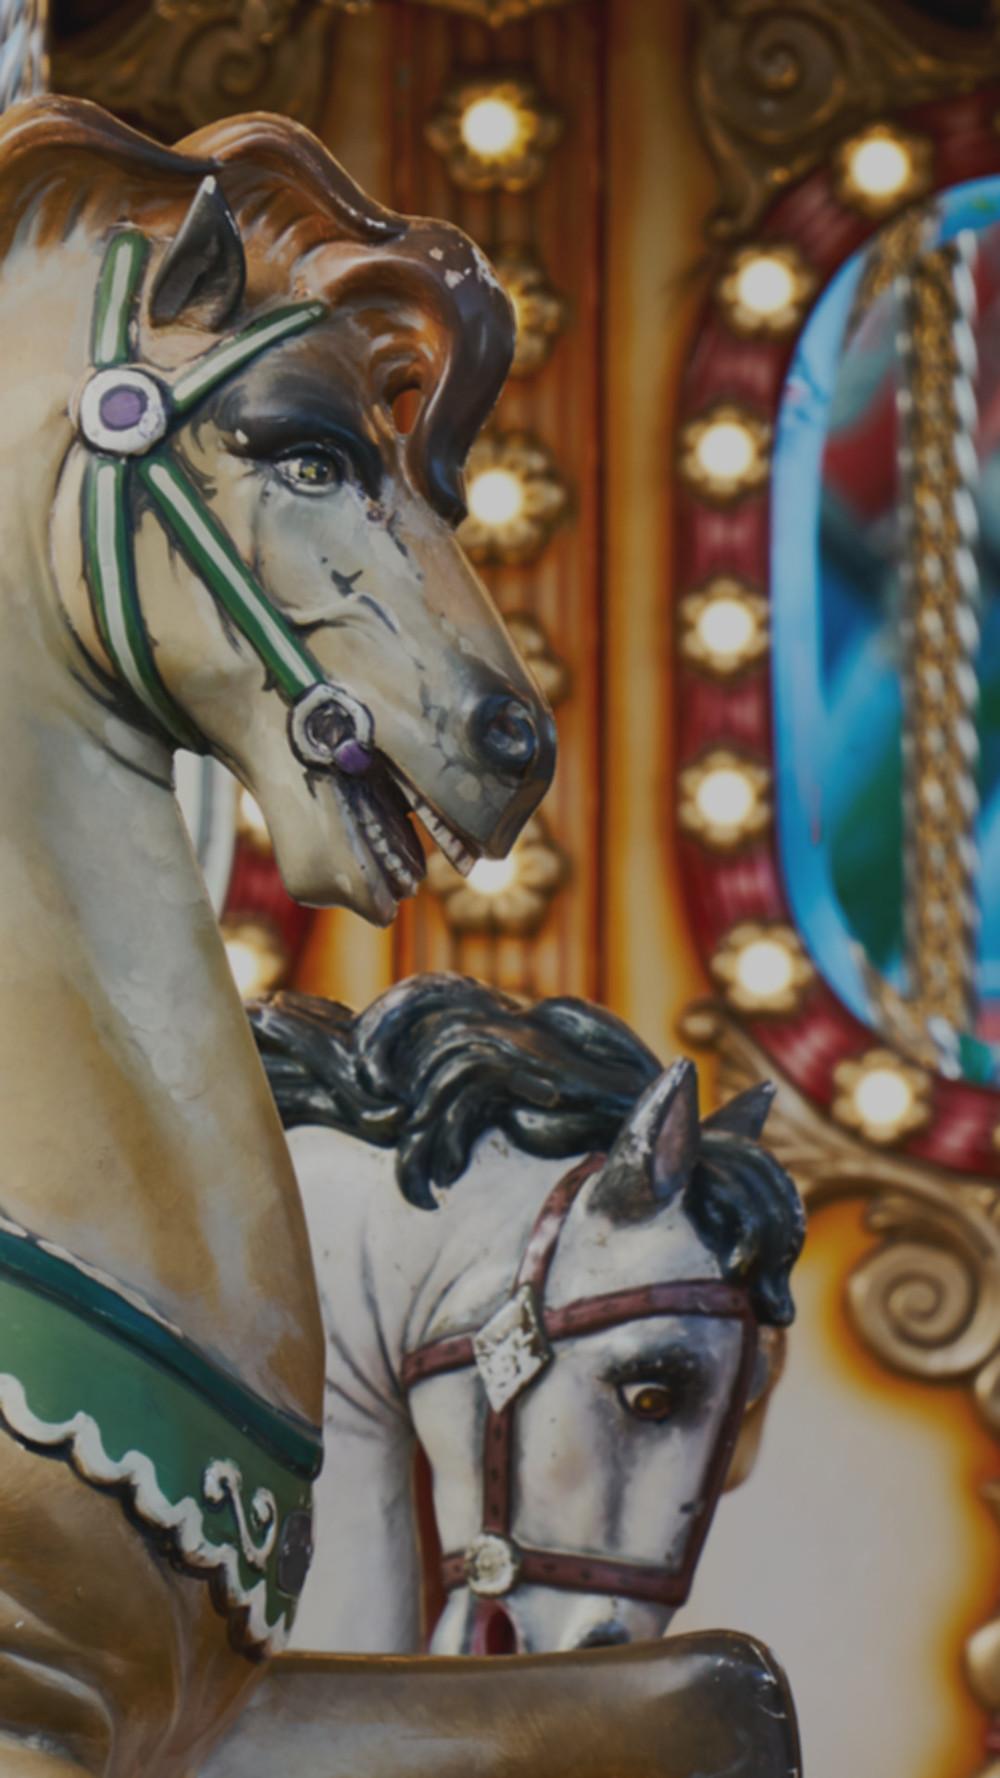 Karussell-Pferde; Foto: Ignasoler